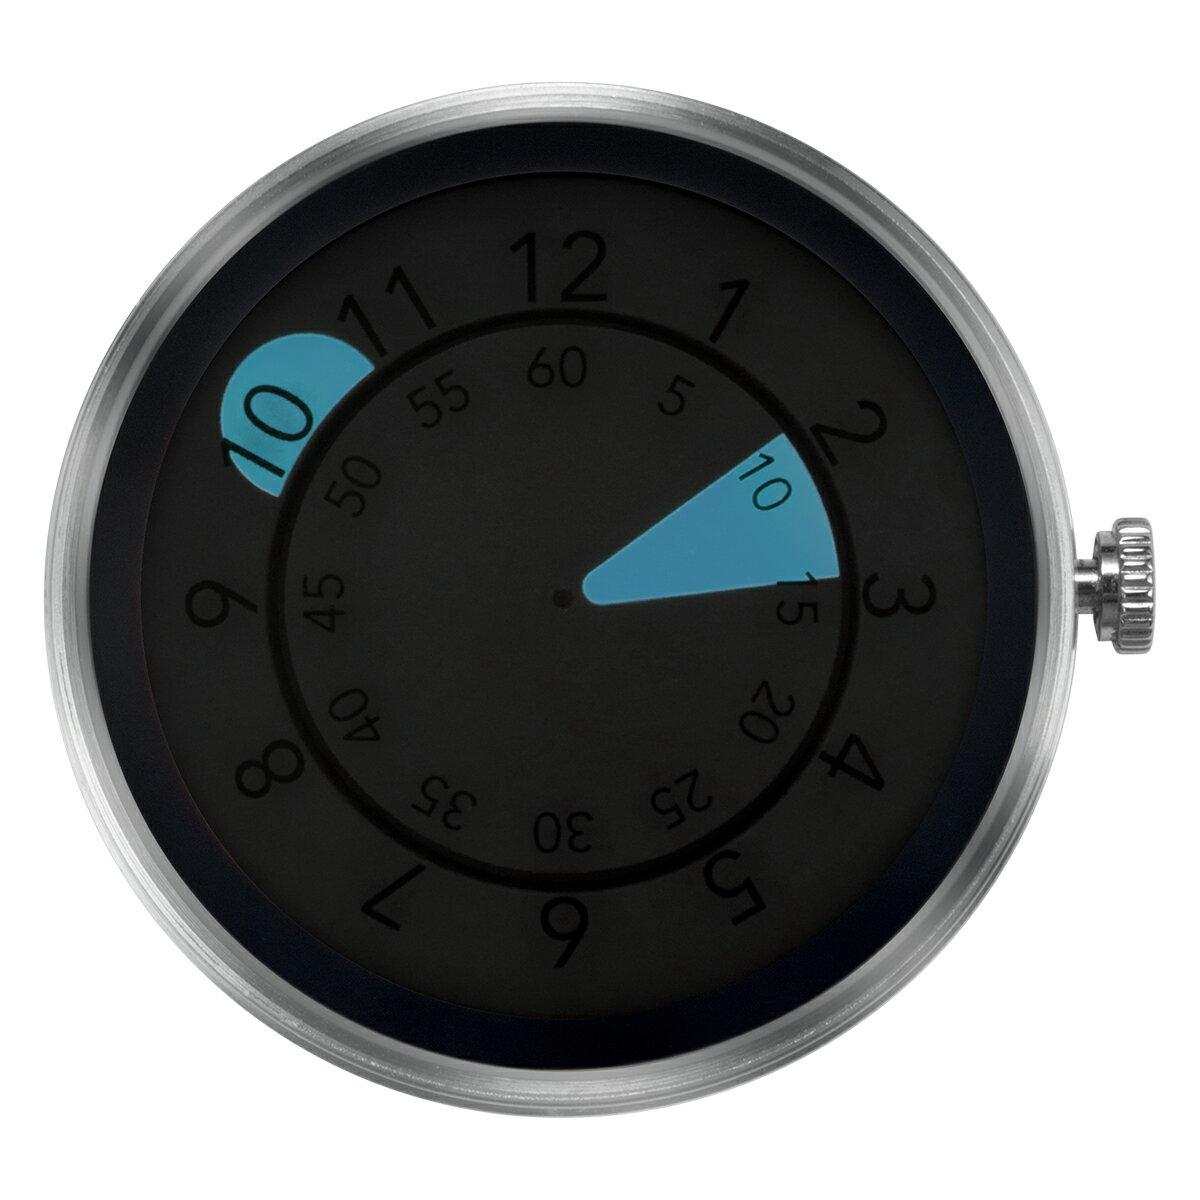 ZEROO 交換用クロックボディ ZEROO AQUA DROP ゼロ 電池式クォーツ 腕時計 [M10039]